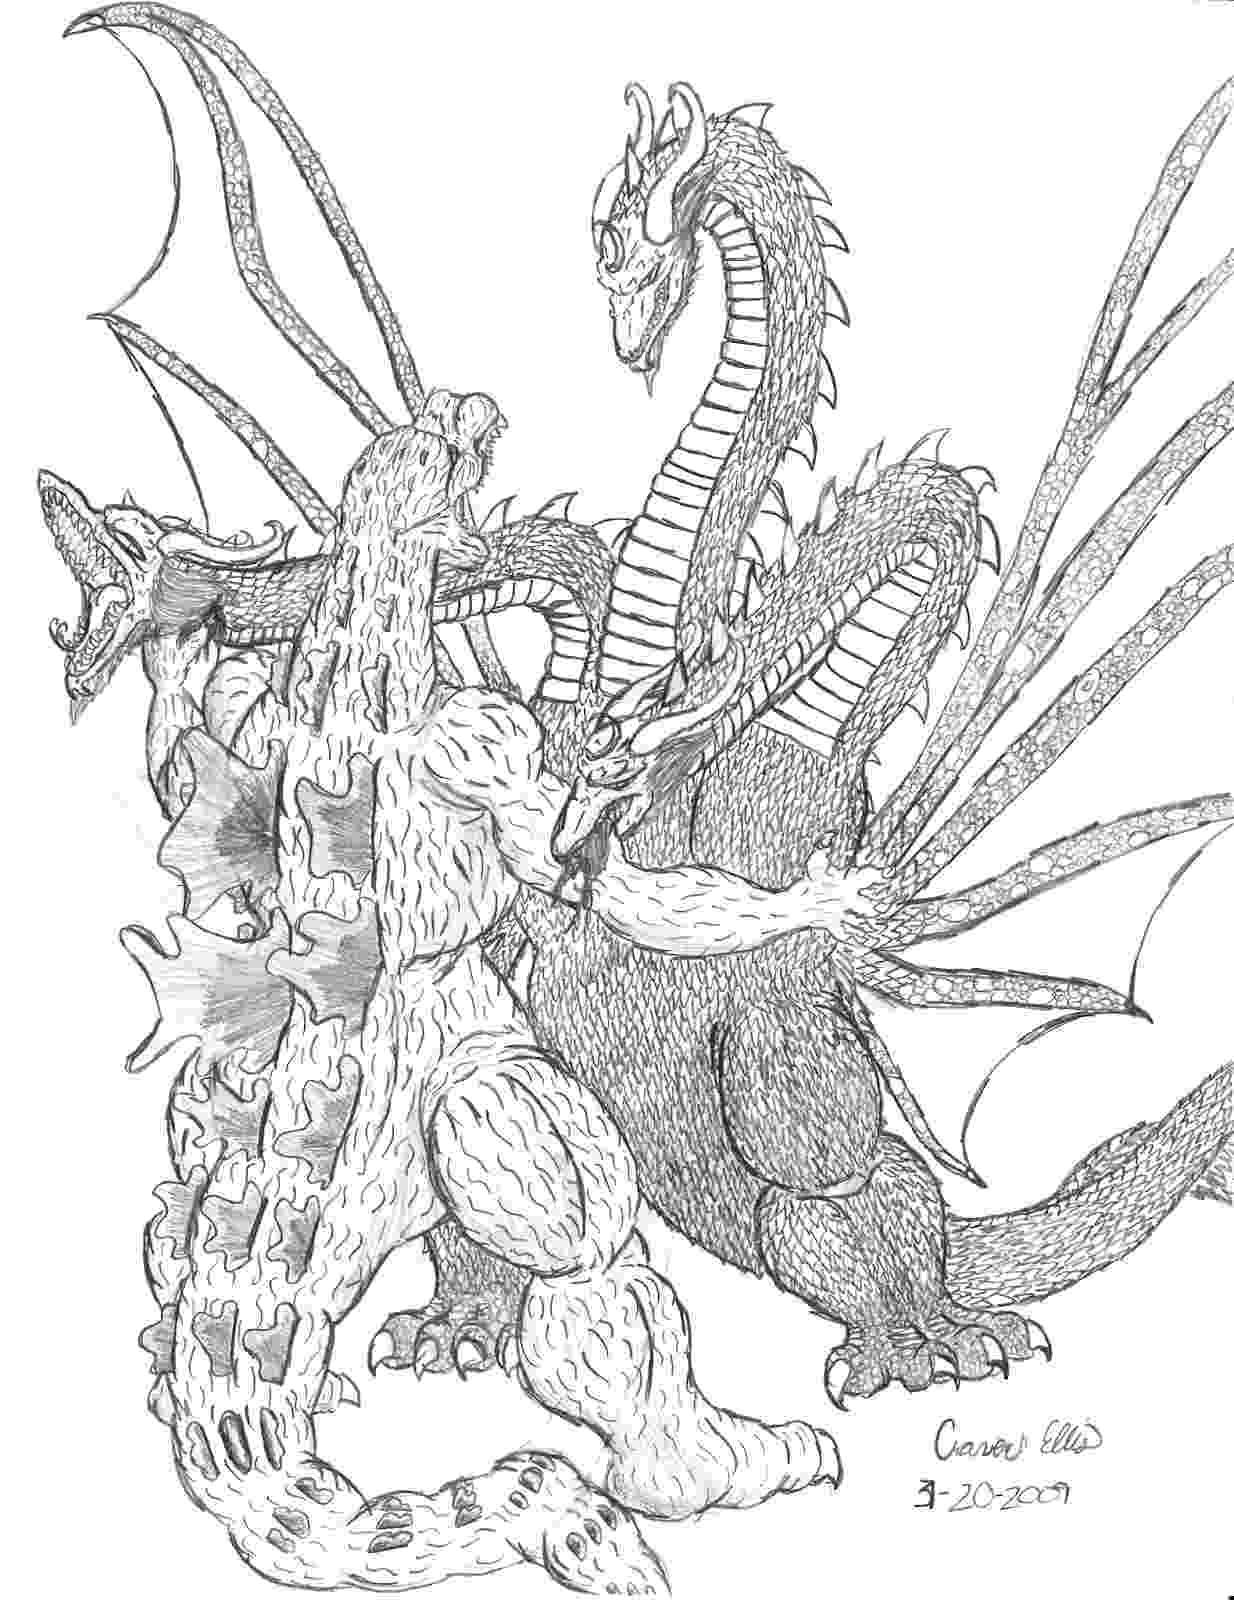 godzilla coloring pages kaiju battle saturday showcase godzilla vs king ghidorah coloring godzilla pages